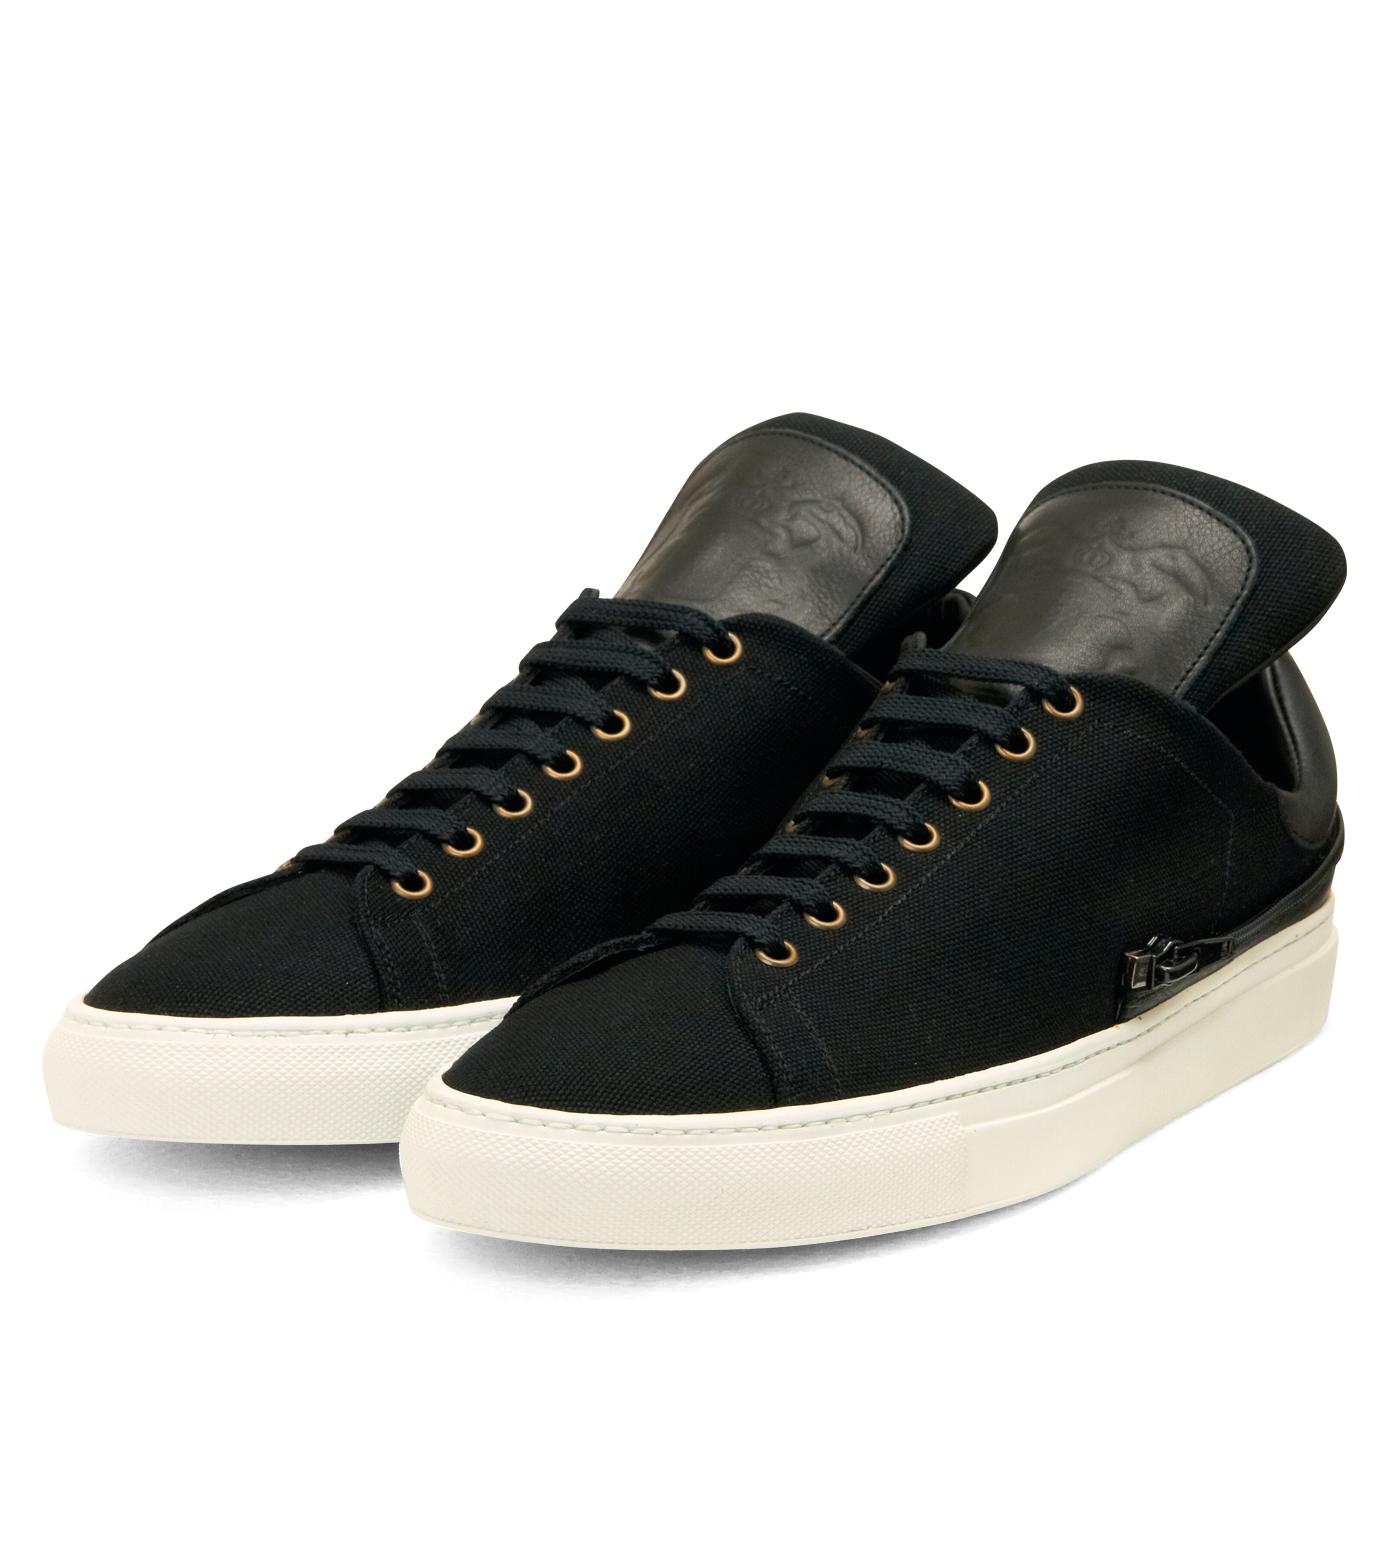 Trussardi(トラサルディ)のSeparate Sneaker-BLACK-1RS721-13 拡大詳細画像4